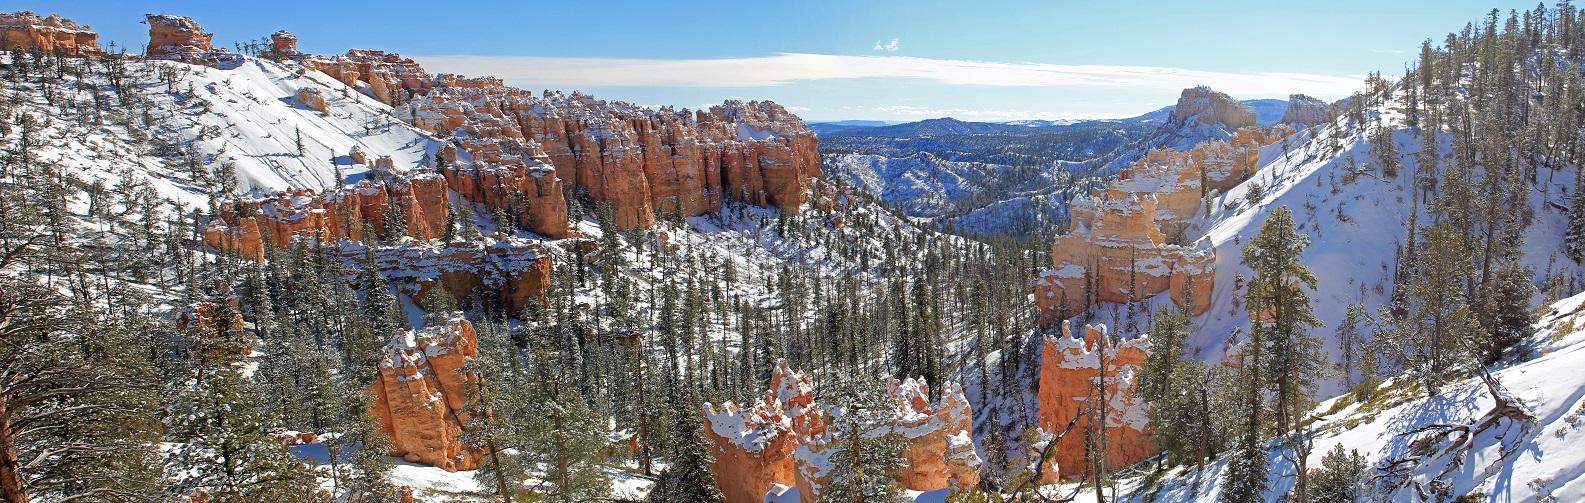 Bryce Canyon (8).jpg